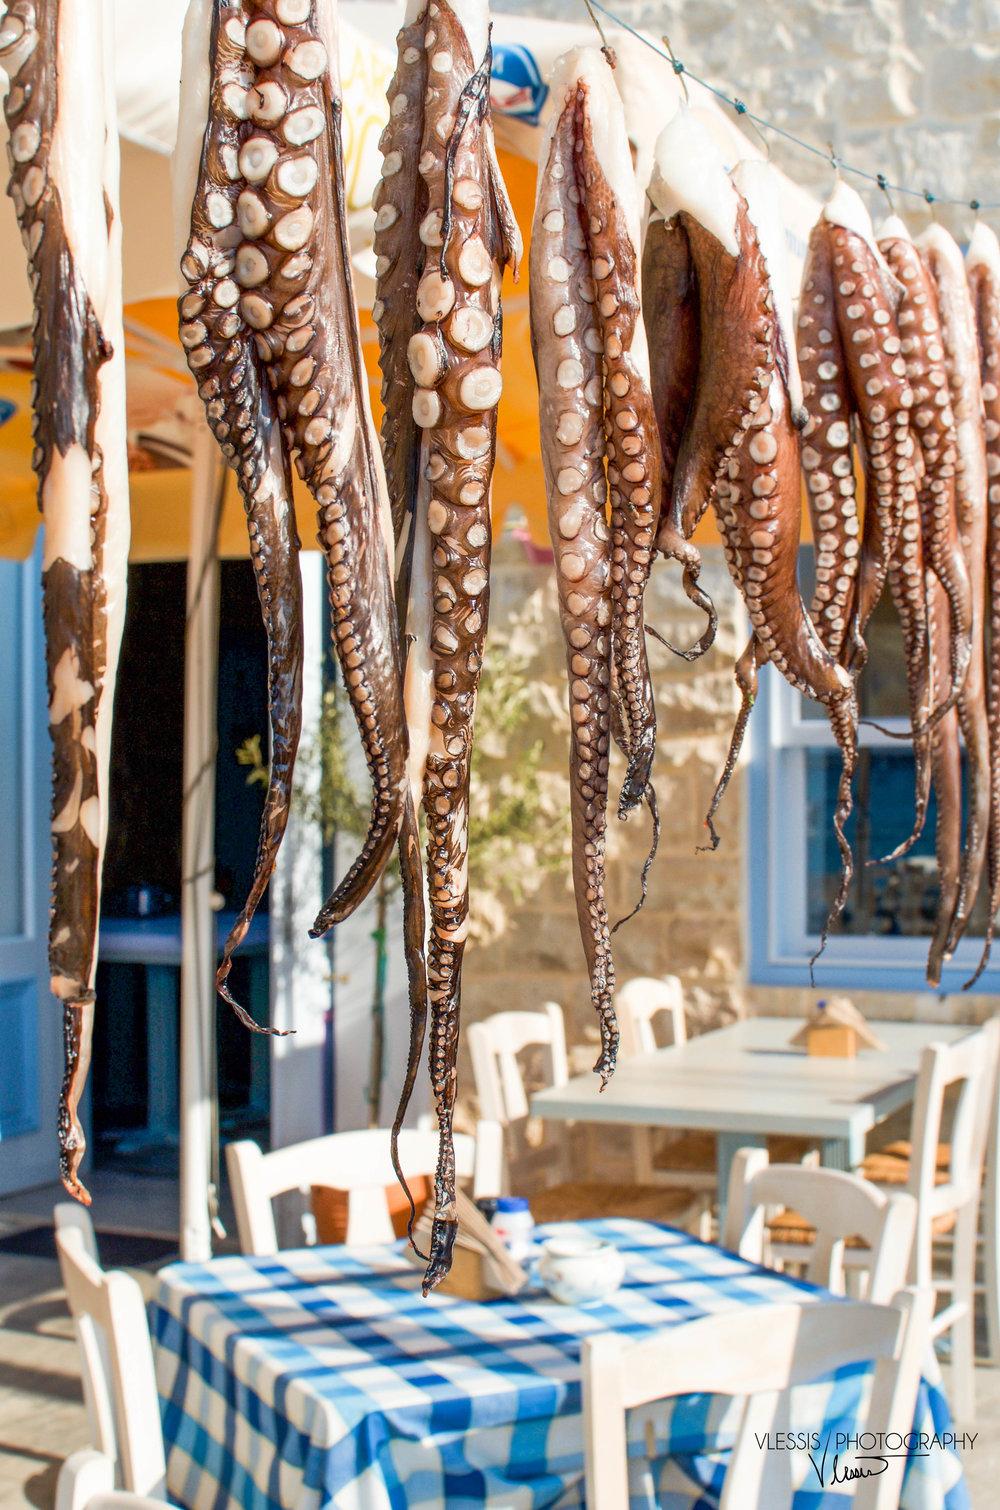 Greece (1 of 1)-6 copy 4.jpg